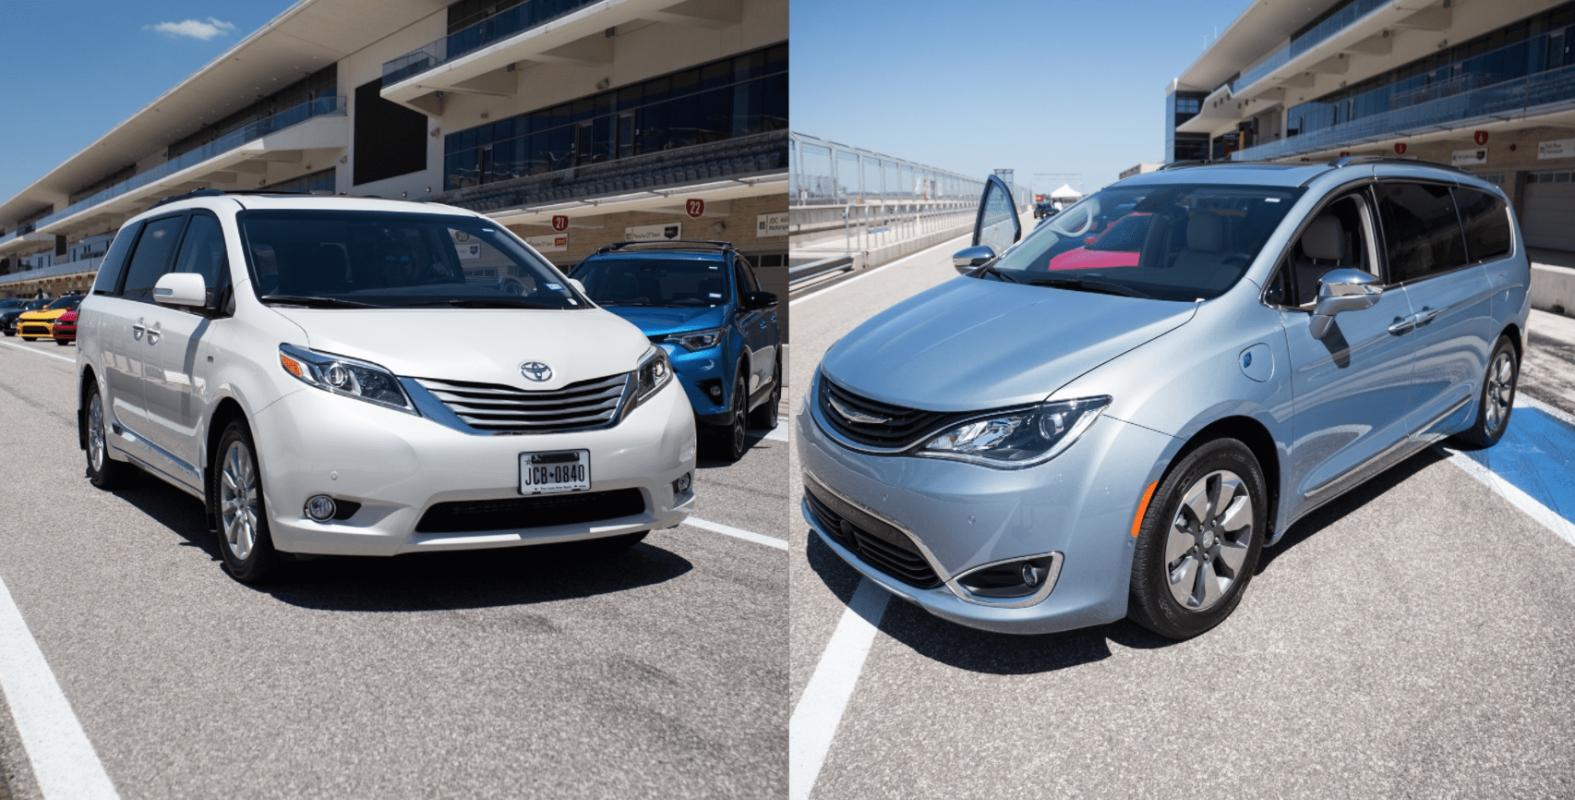 Minivan Drive: Toyota Sienna vs Chrysler Pacifica Hybrid